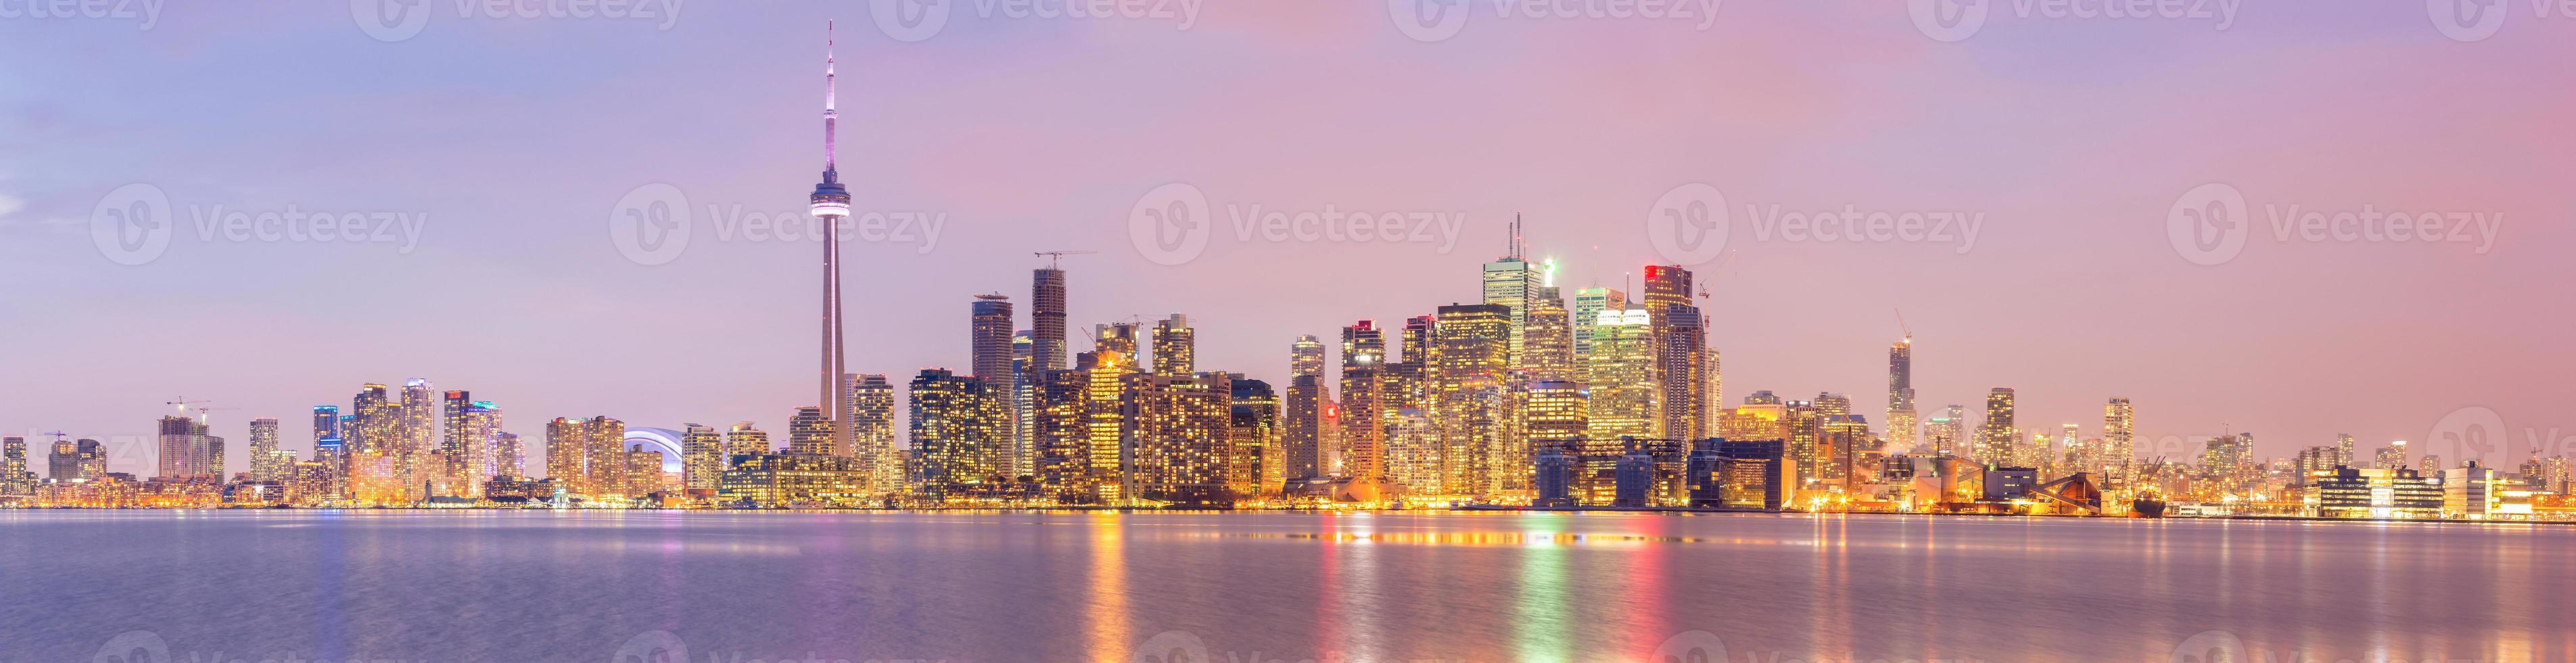 panorama sullo skyline di toronto foto